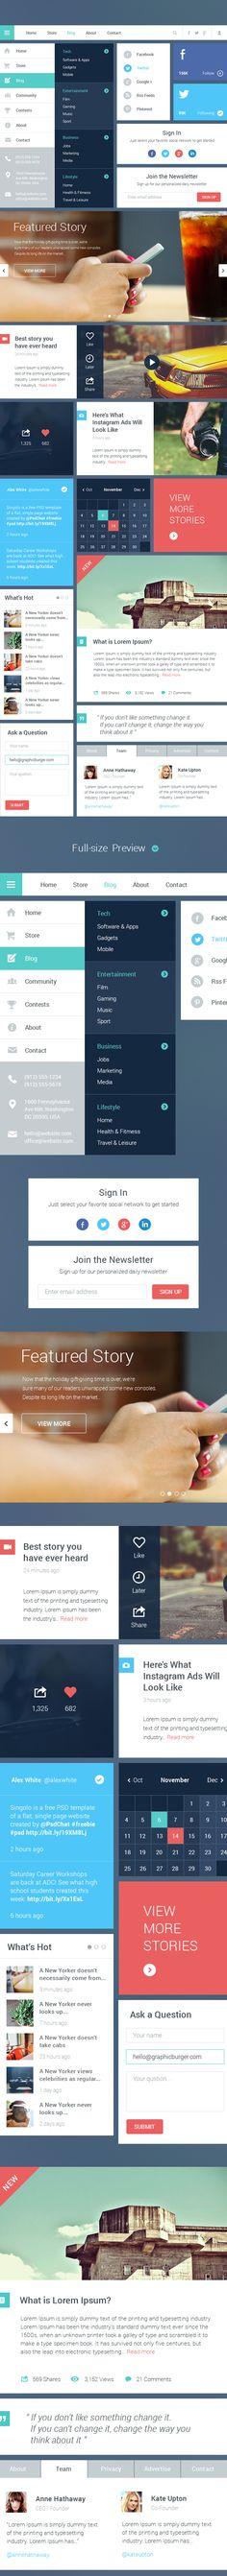 Blog/Magazine UI Kit #2 by Raul Taciu, via Behance